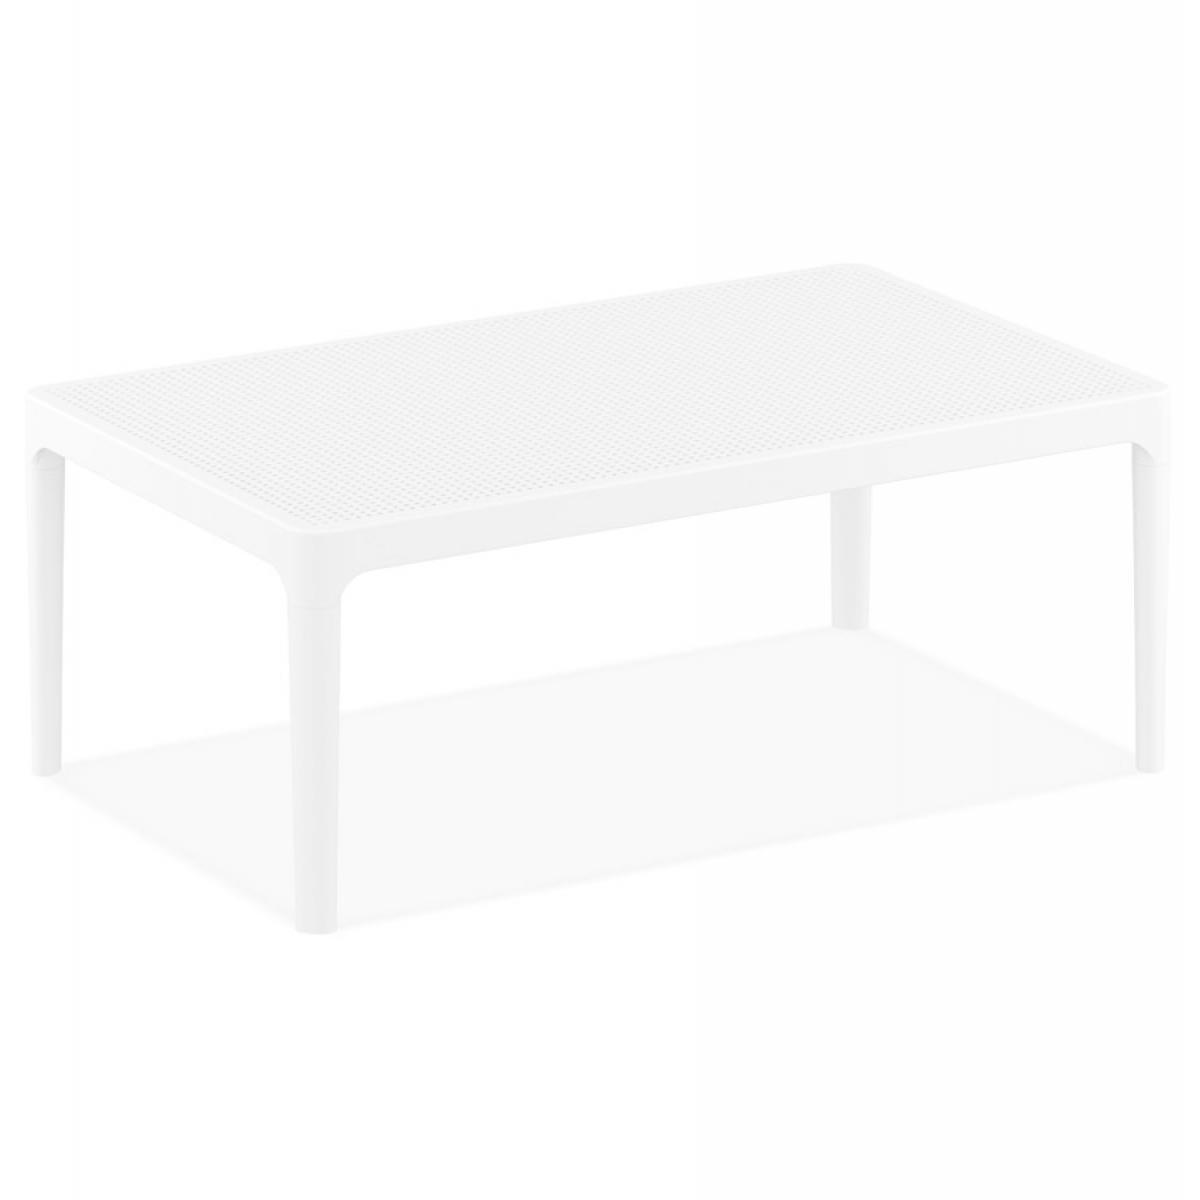 Alterego Table basse de jardin 'DOTY' blanche design - 100x60 cm